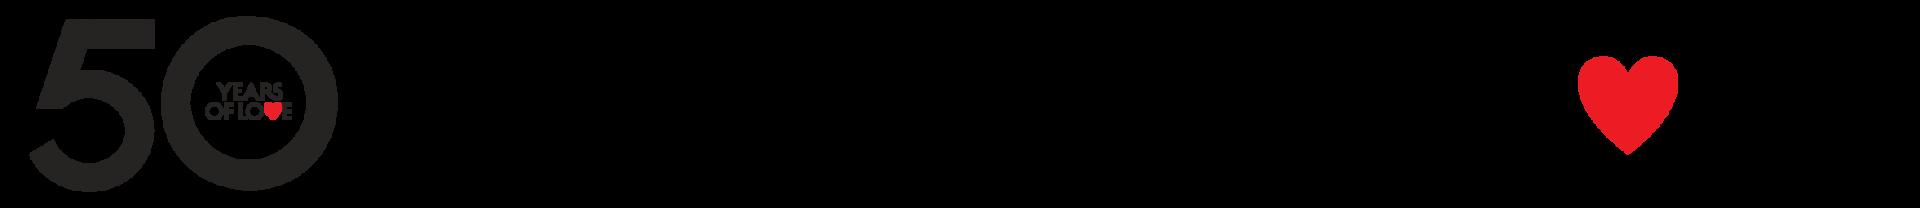 VTC 50 YOL Full Horizontal Black PNG